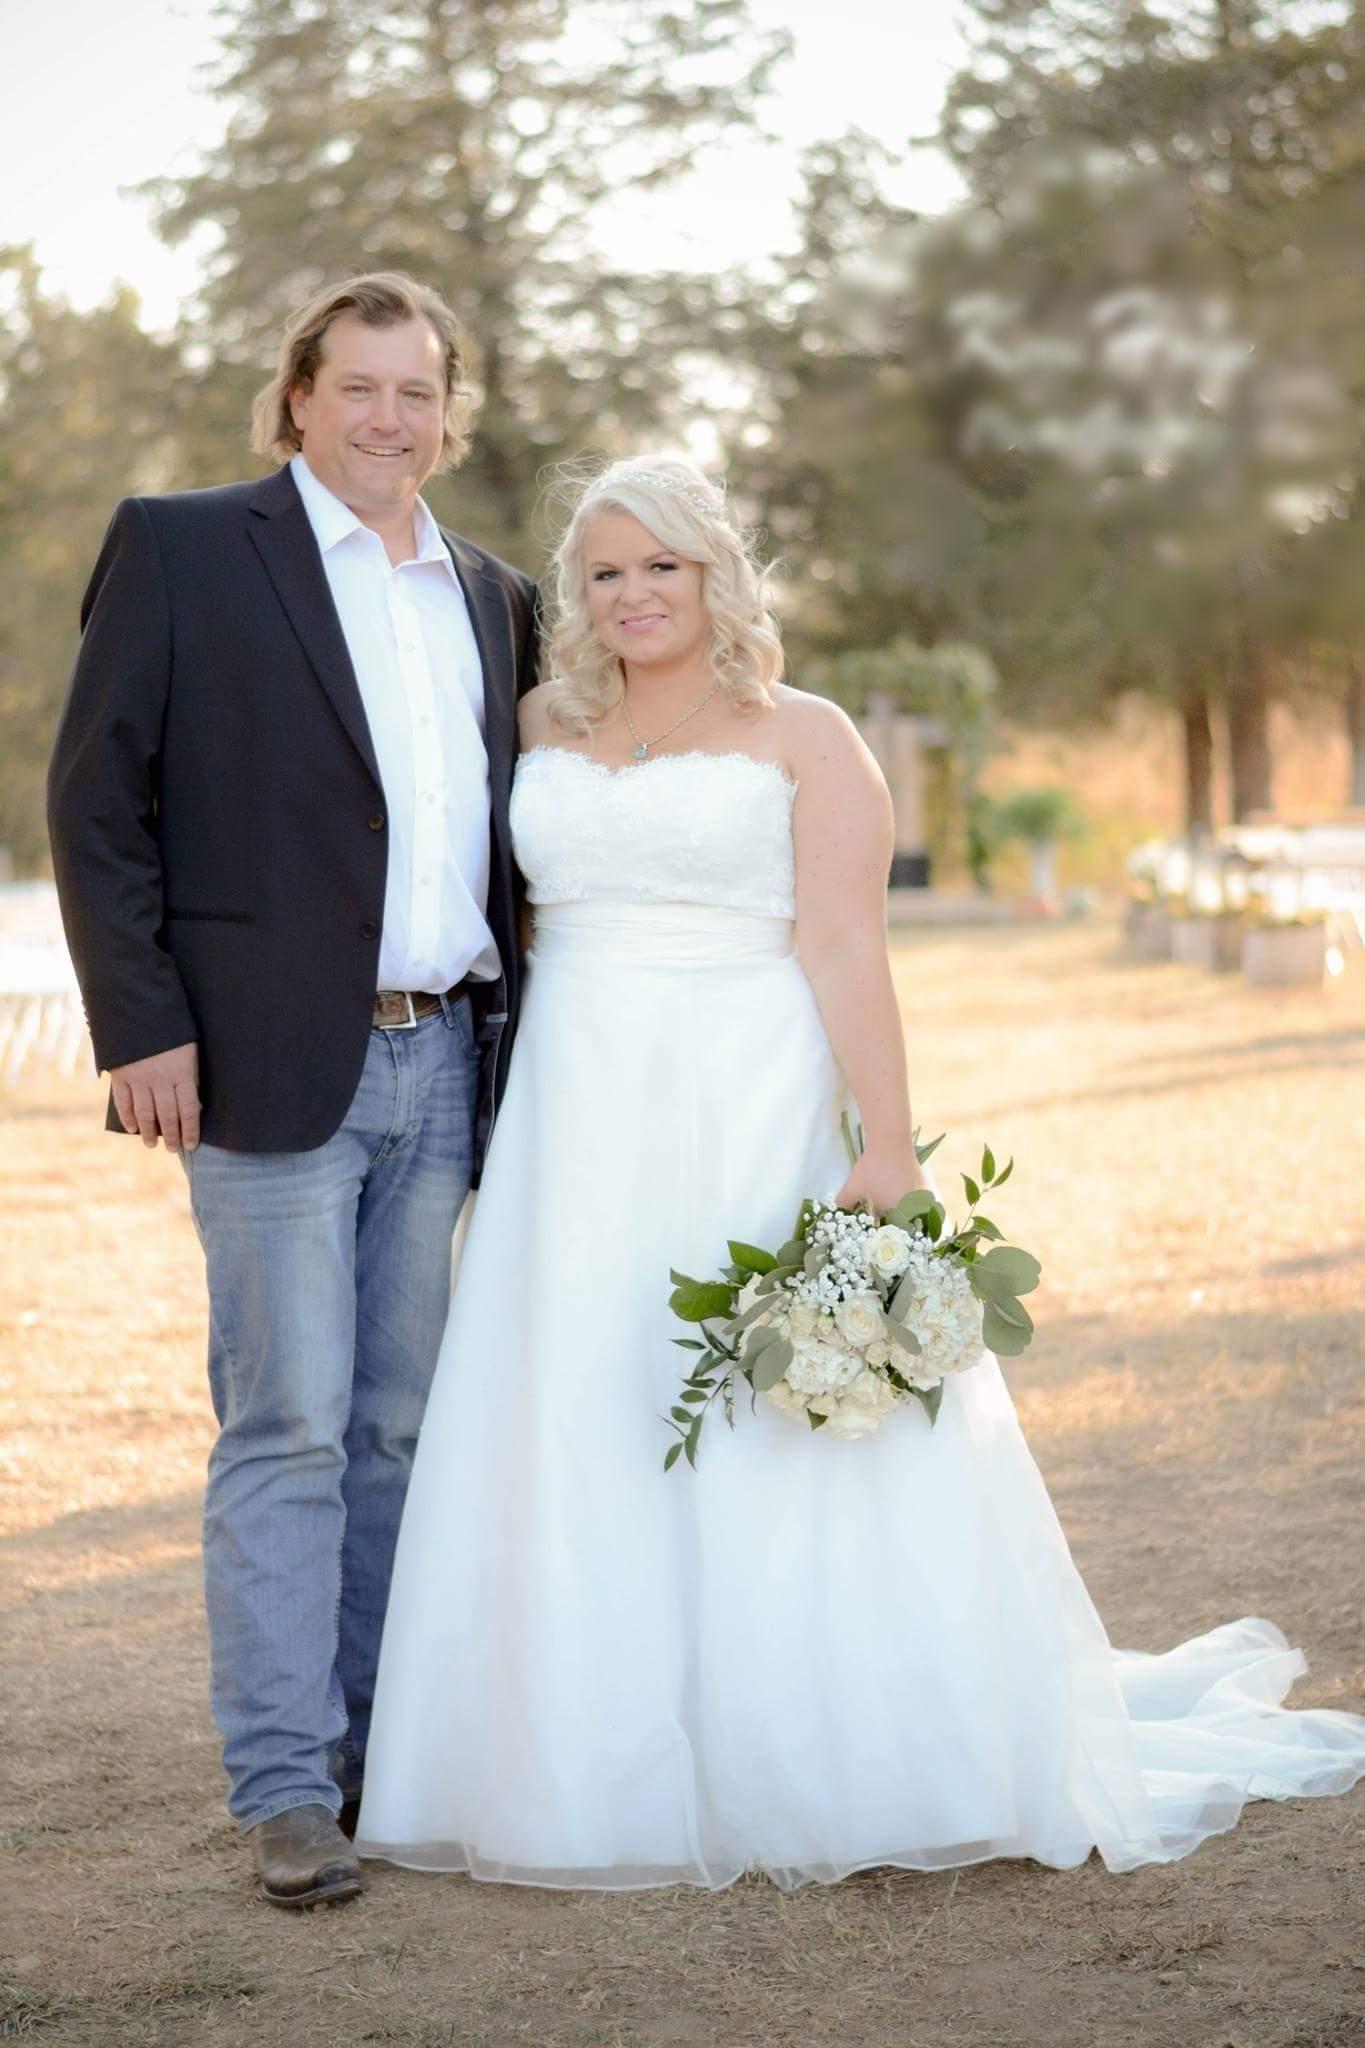 Clint Watts Wedding.Heidibride 2016 Heidi Elnora Atelier